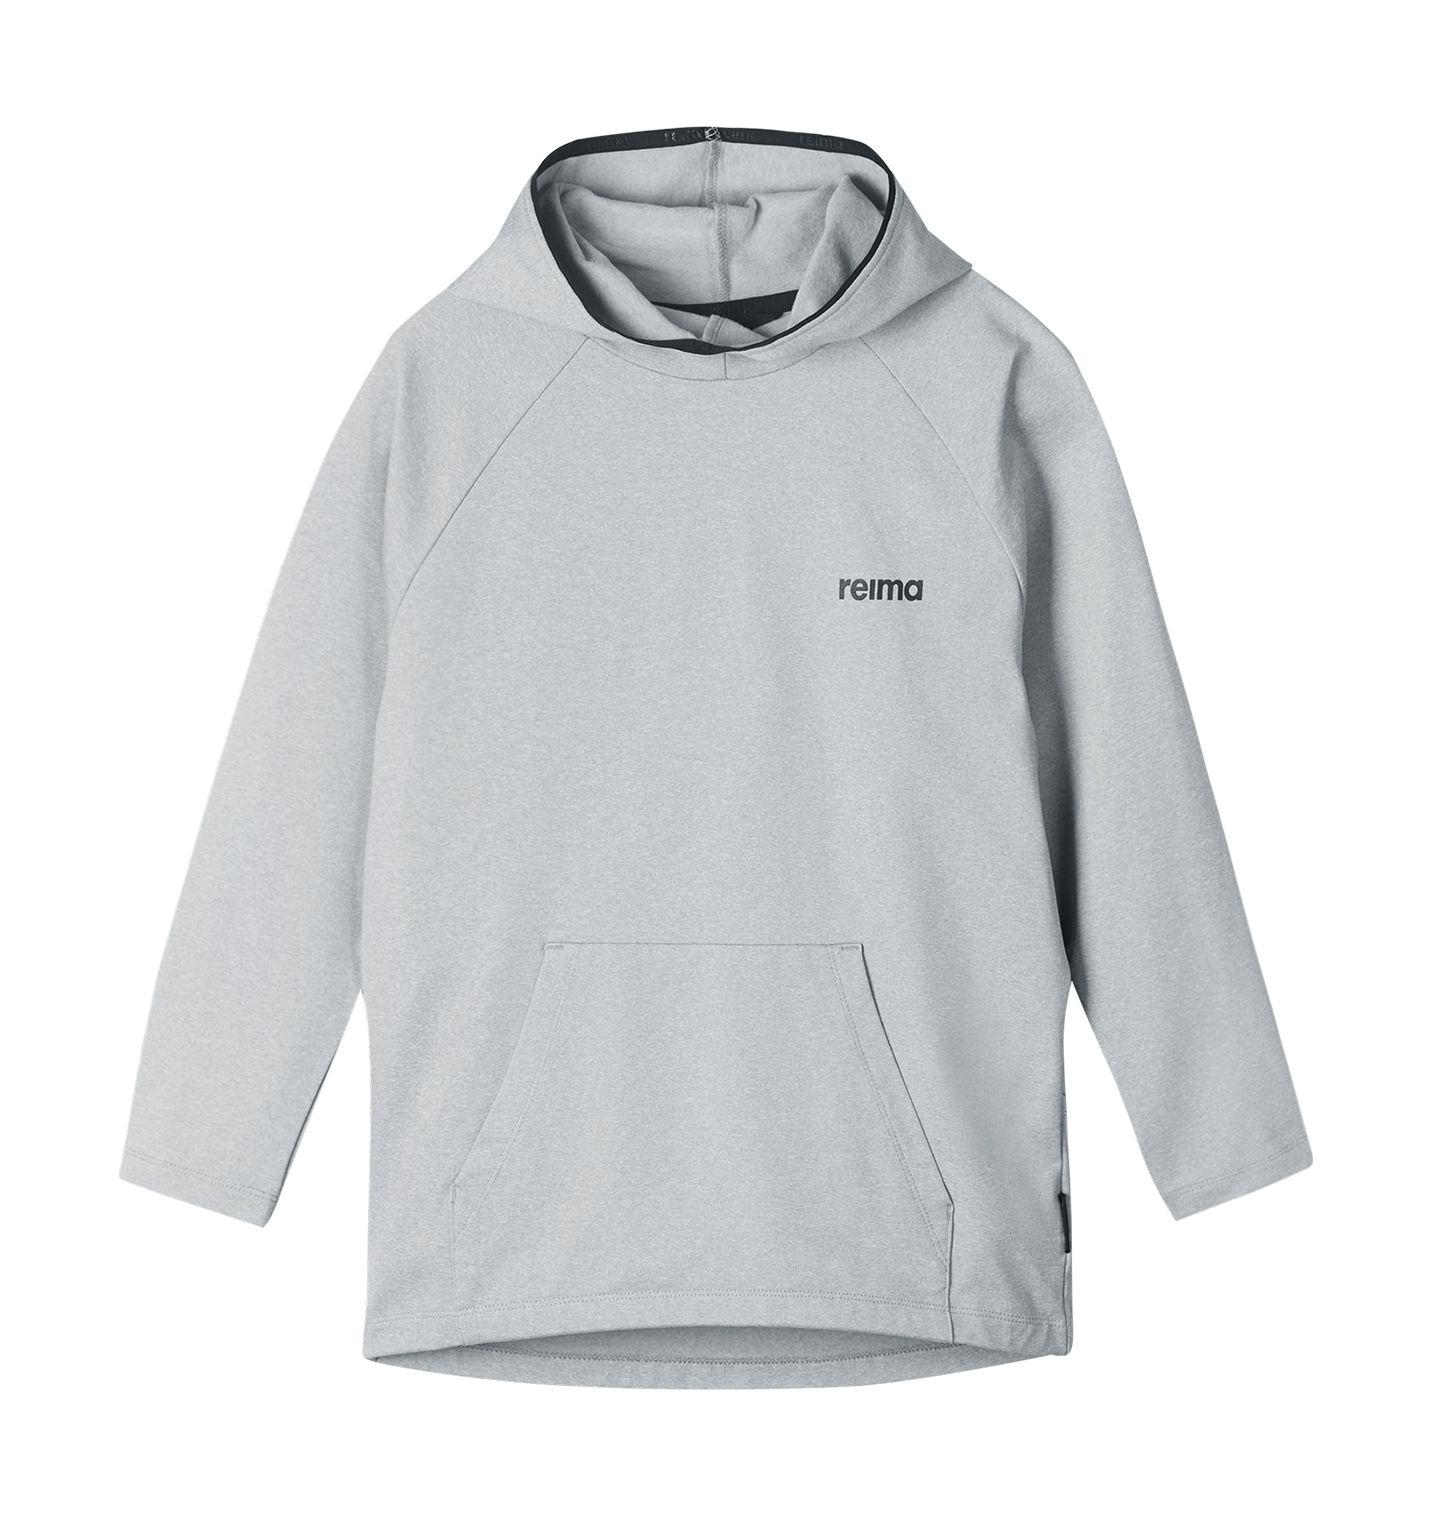 REIMA Funtsi Melange Grey 140